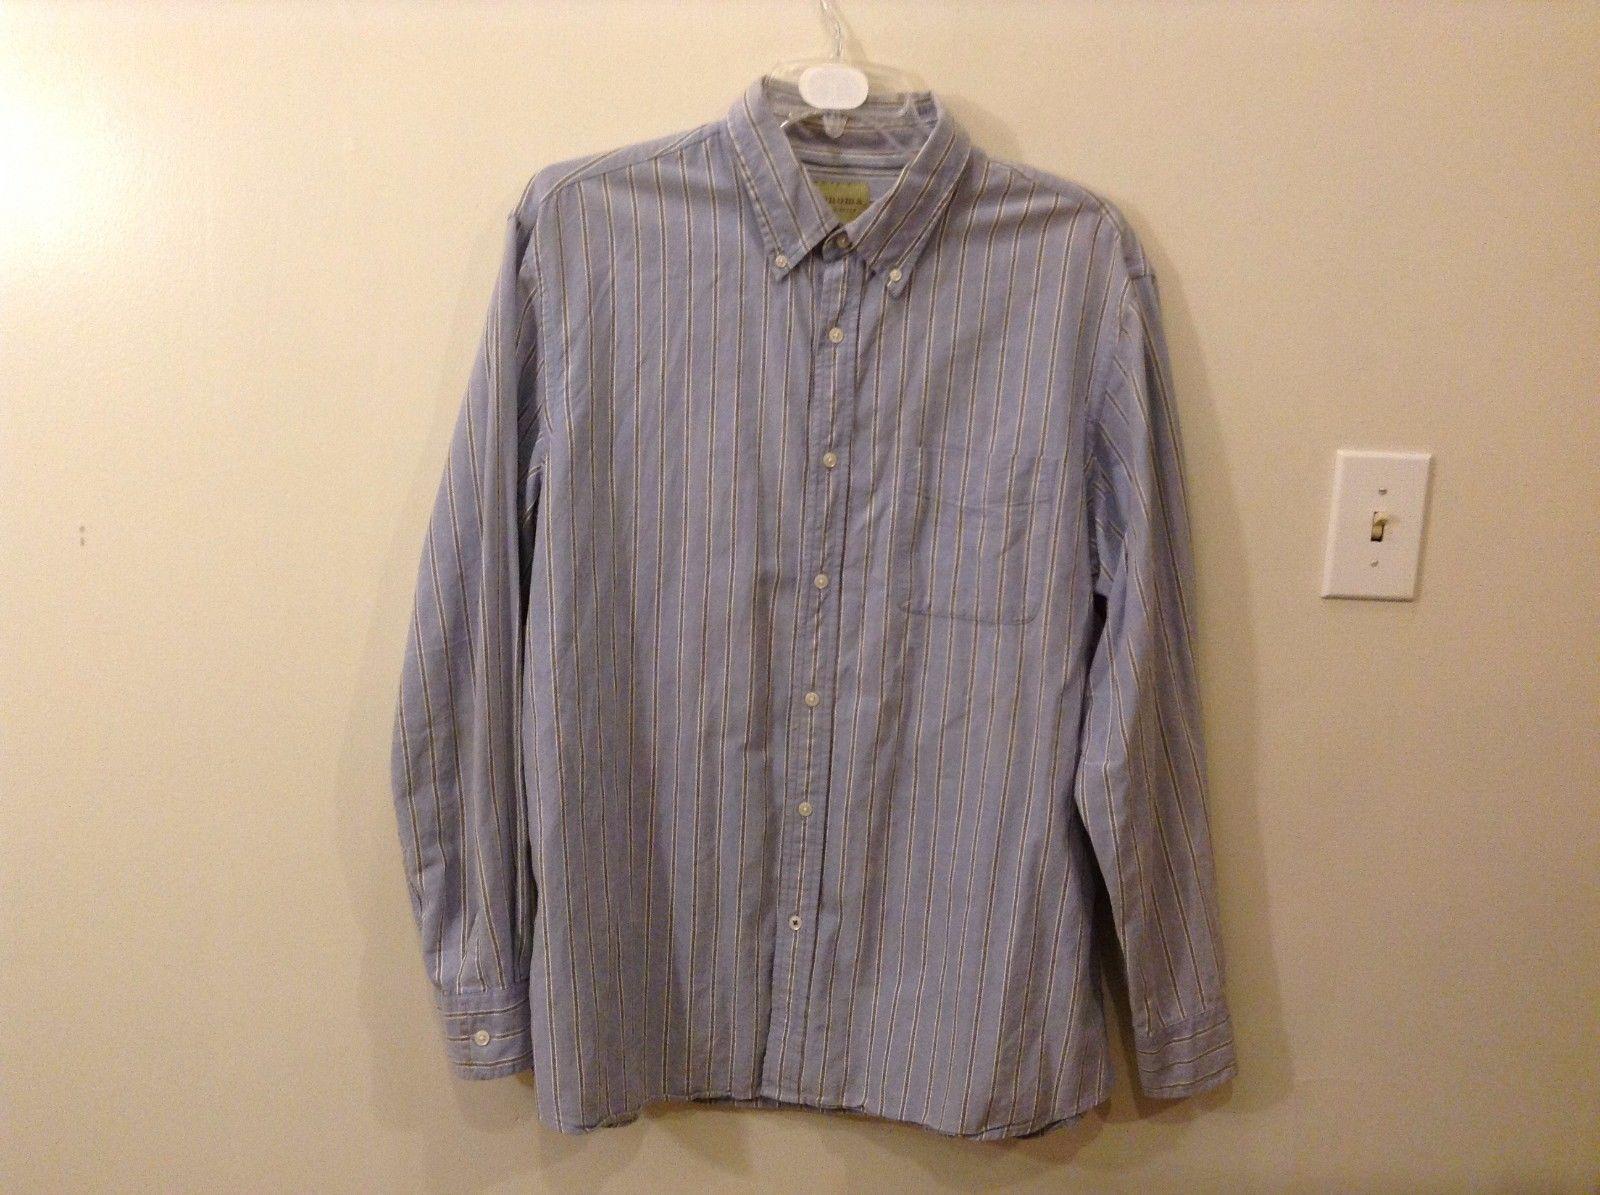 Good Condition Sonoma XL 100% Cotton Soft Blue Periwinkle Striped Button Up